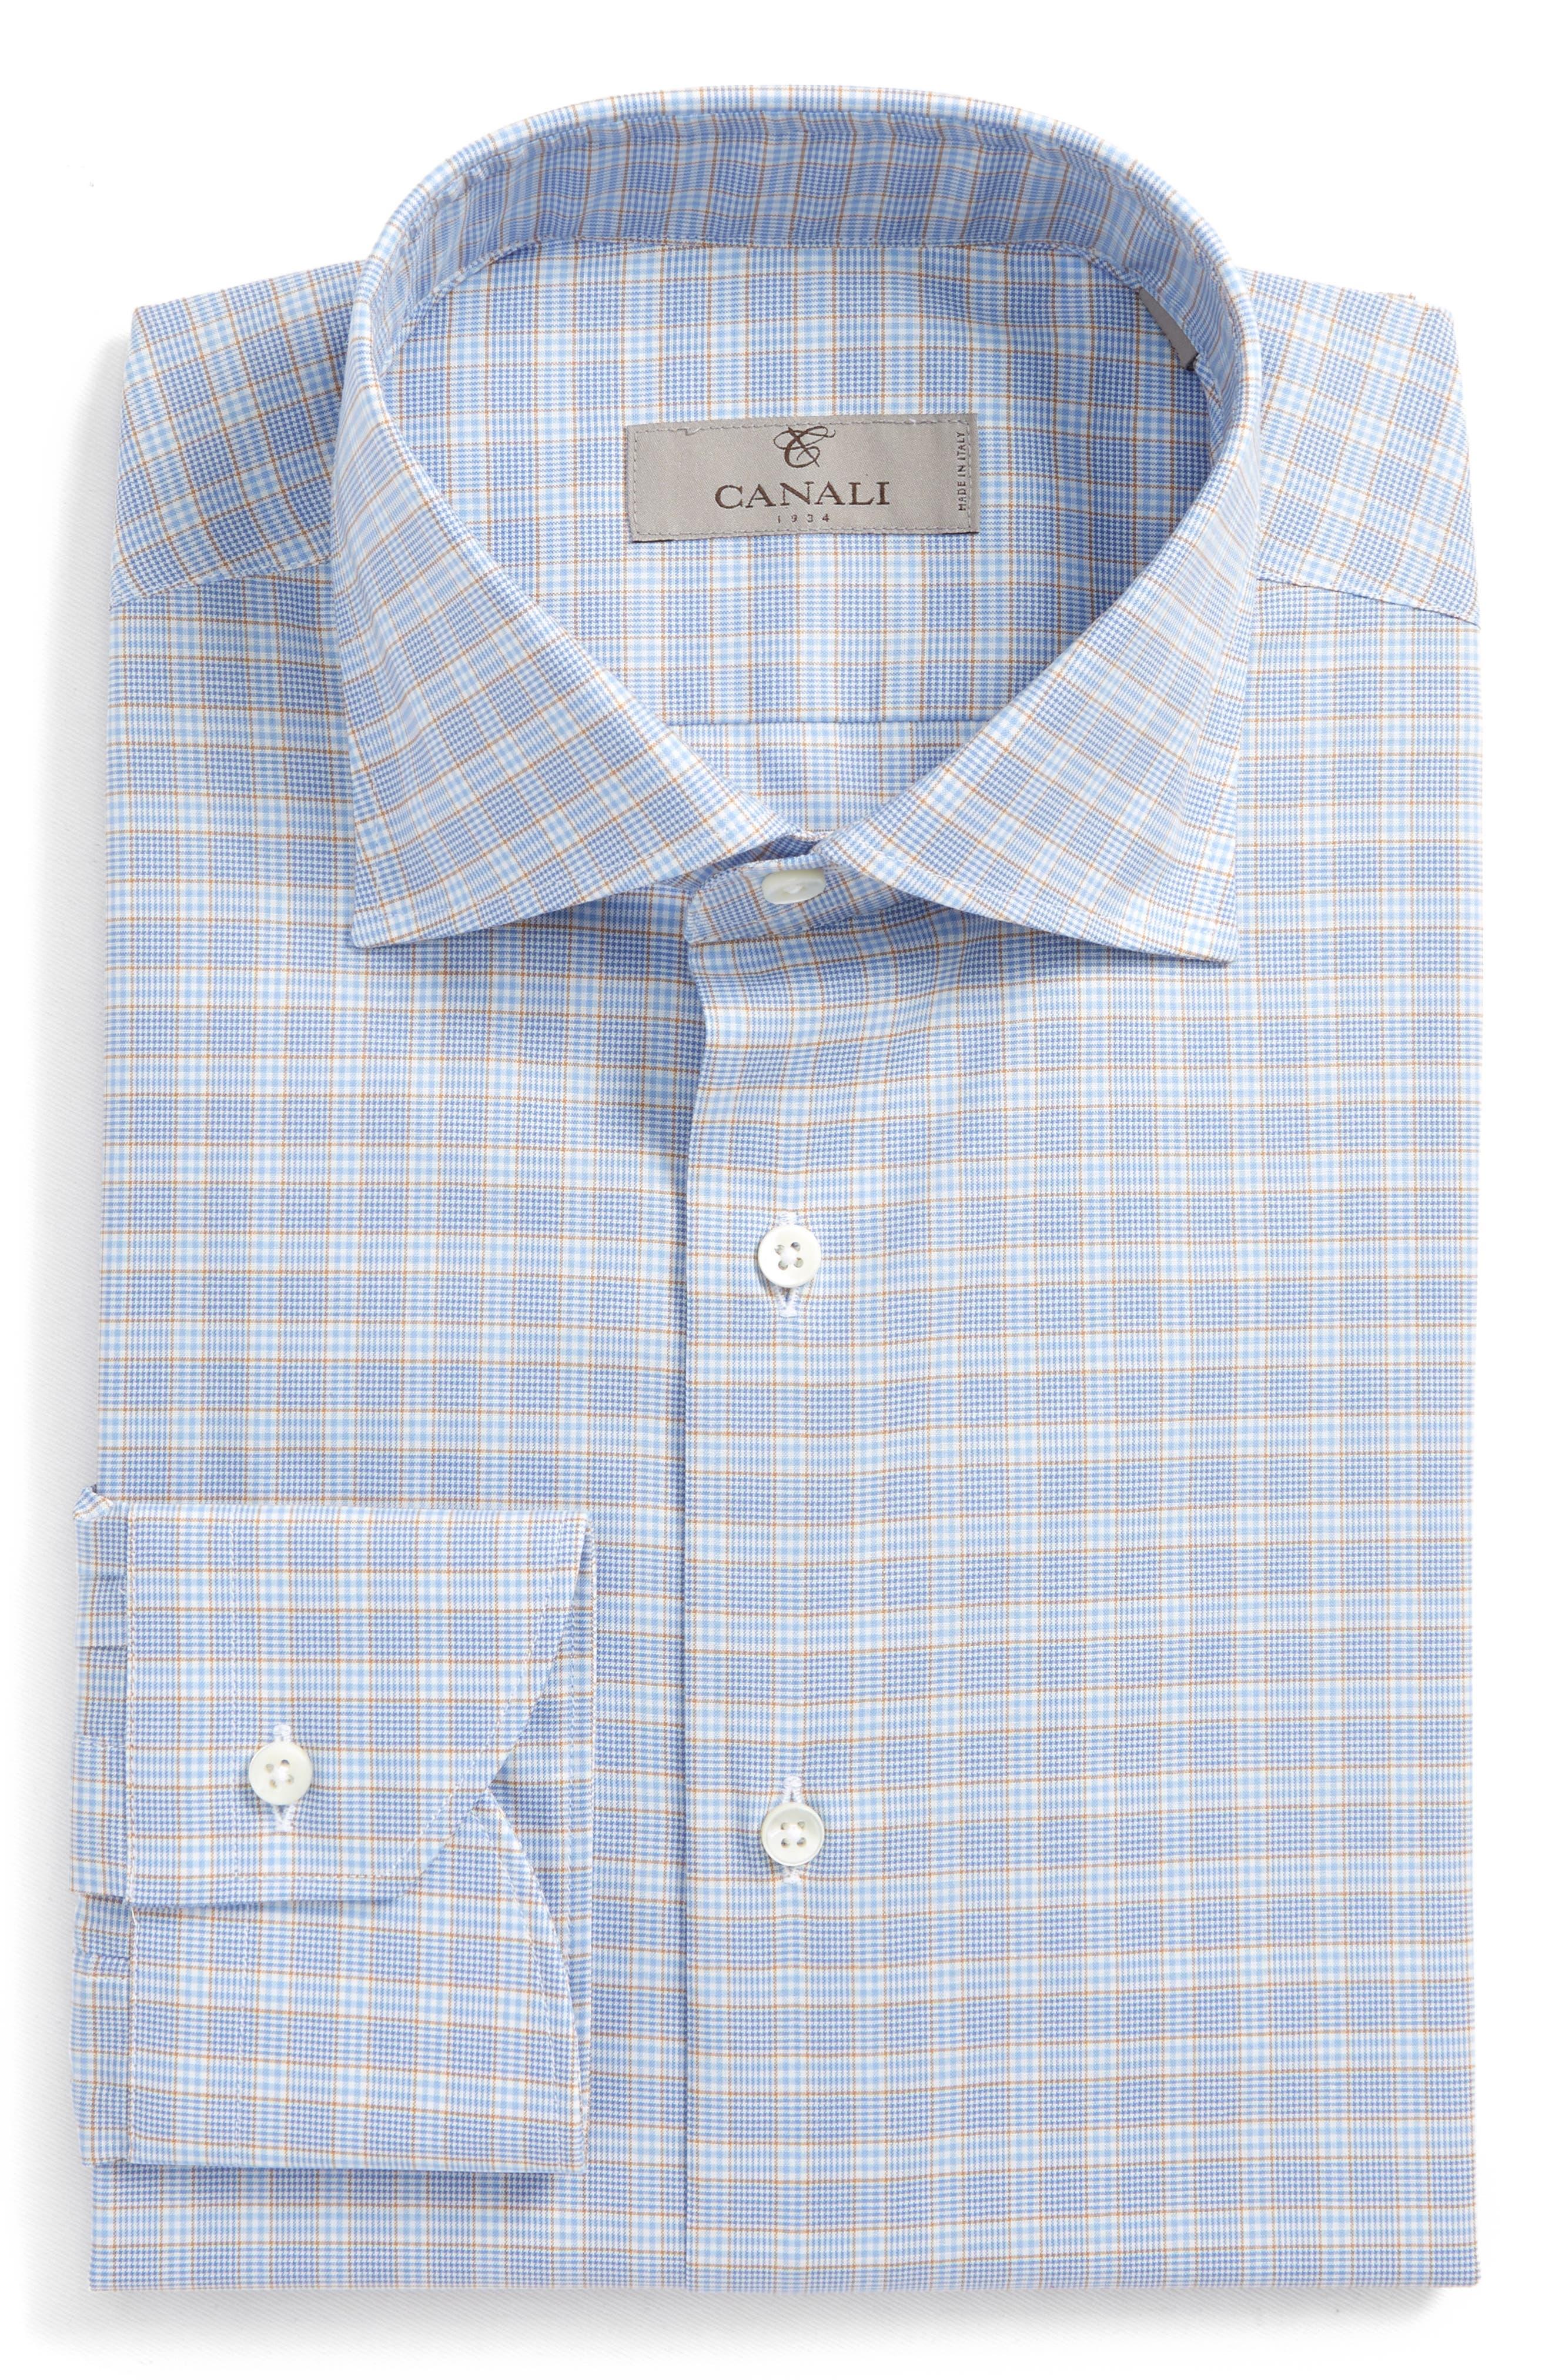 Regular Fit Plaid Dress Shirt,                         Main,                         color,